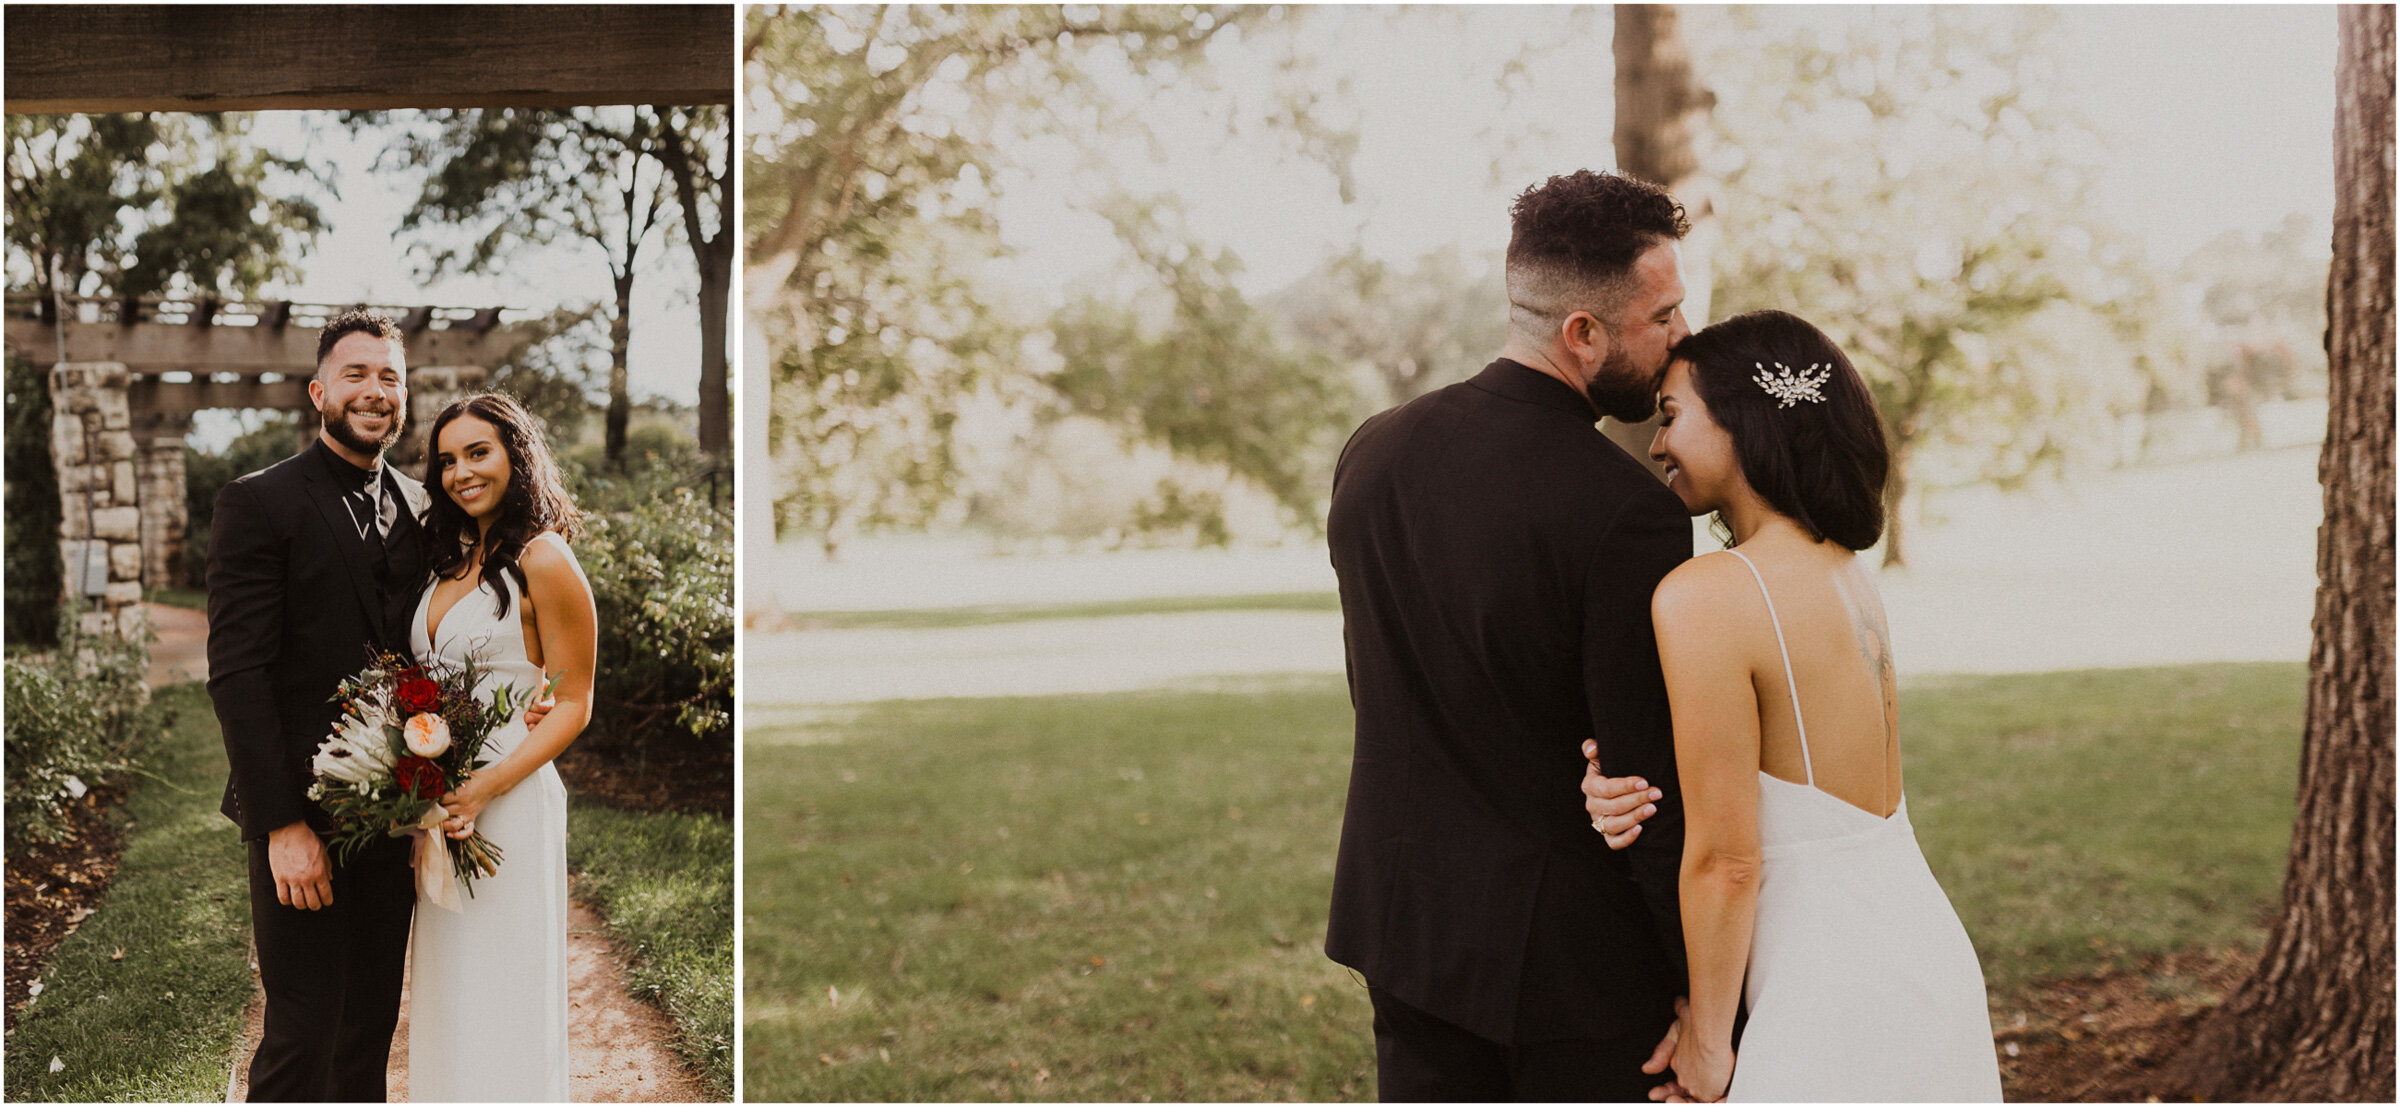 alyssa barletter photography la villa kansas city patio wedding sarah seven wedding dress-32.jpg